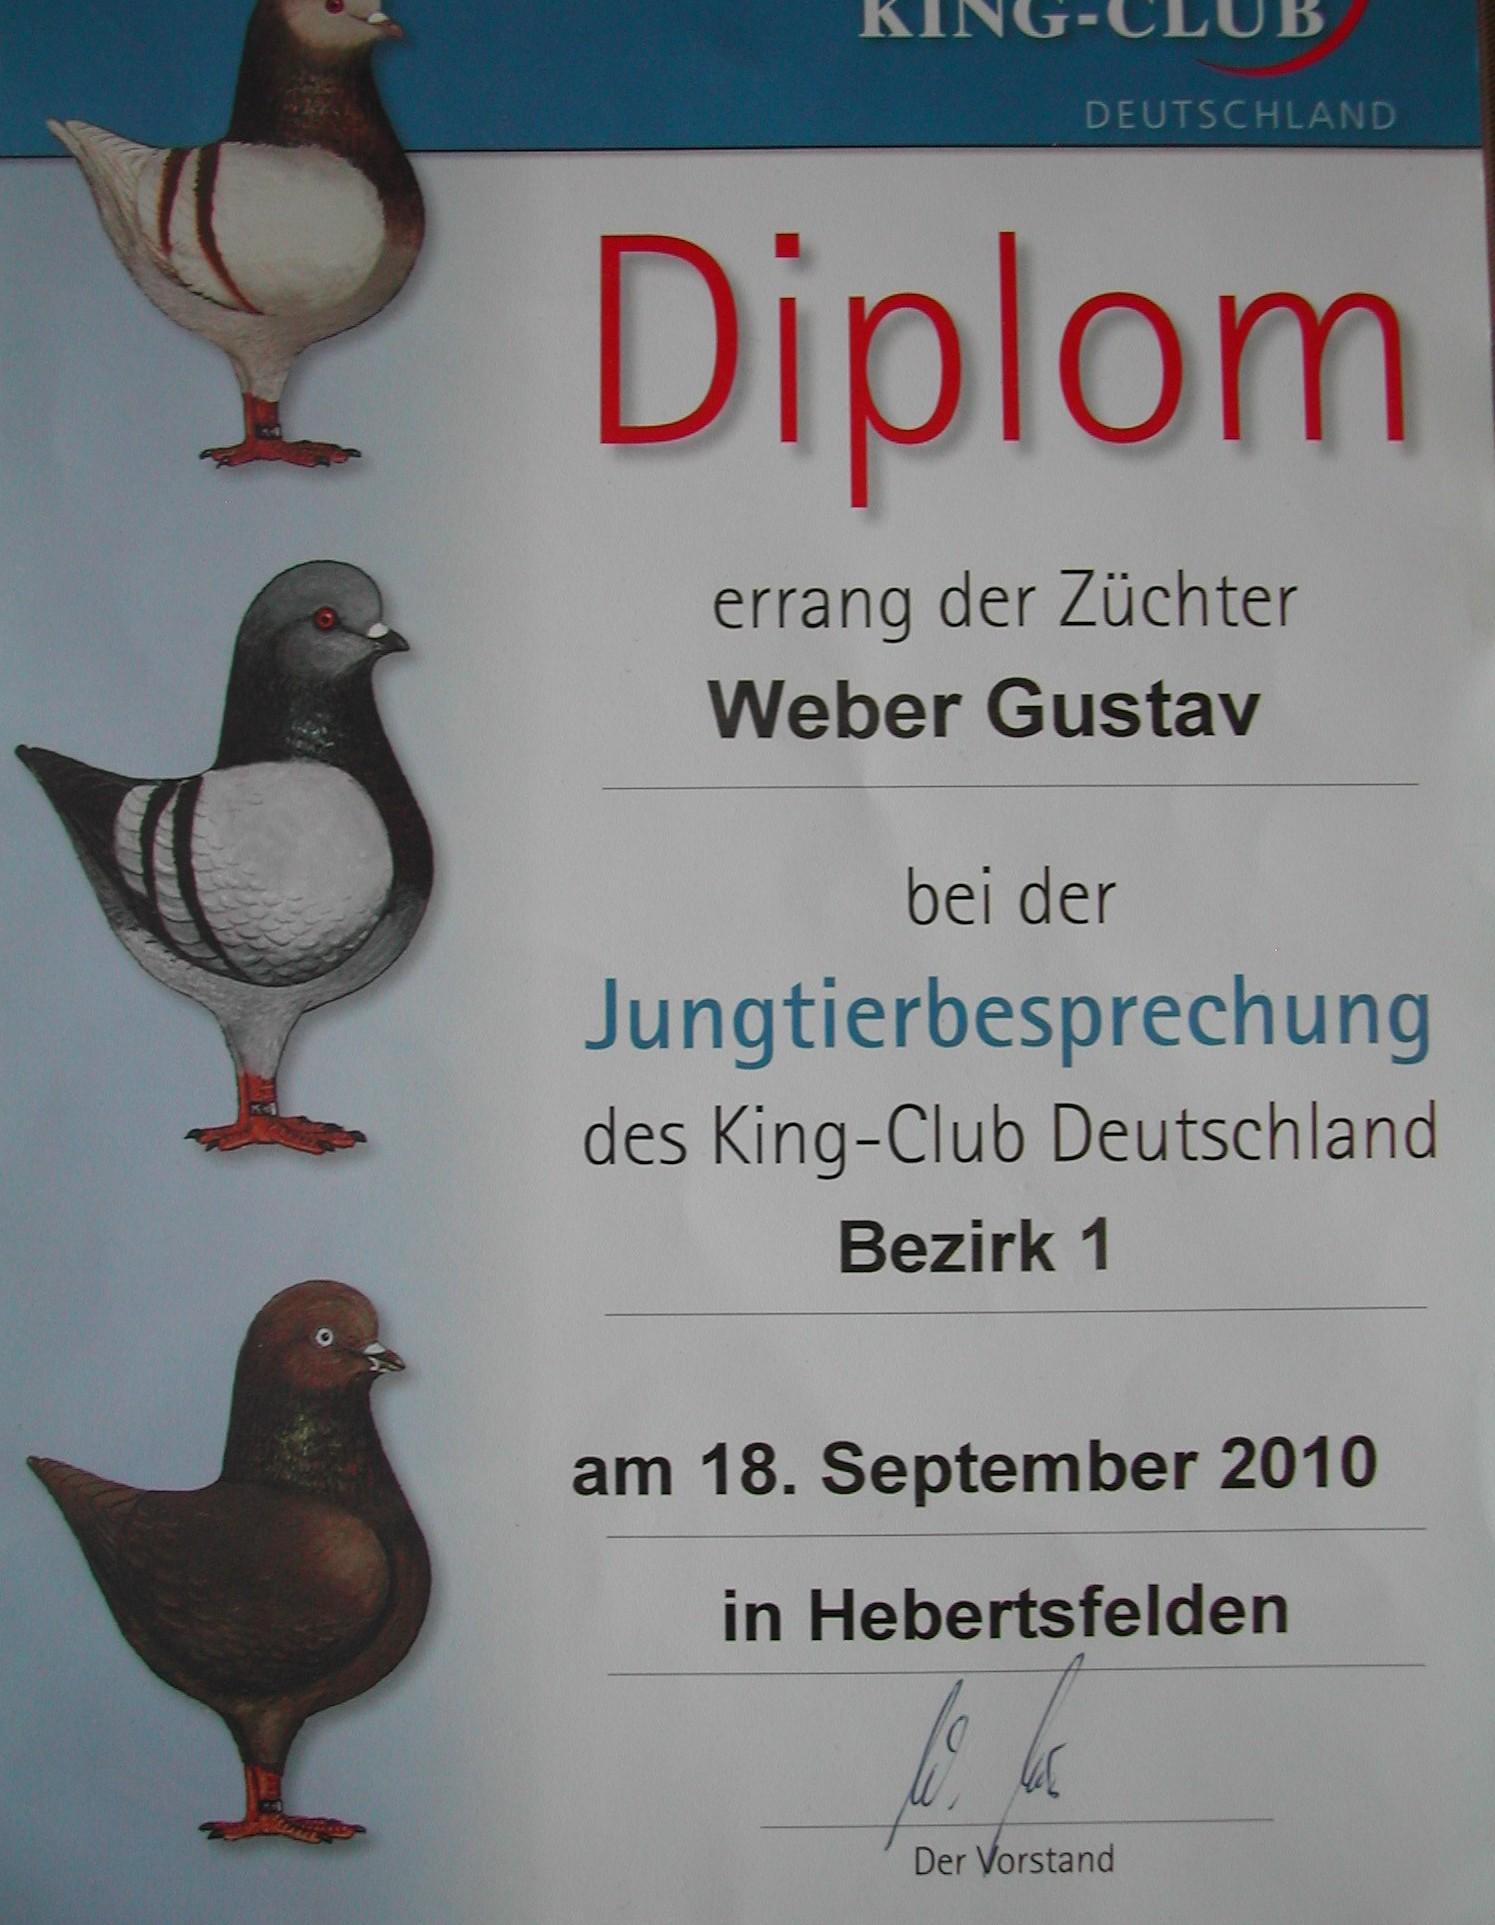 Diplom 1.0 Braun JTB Bez.I 2010